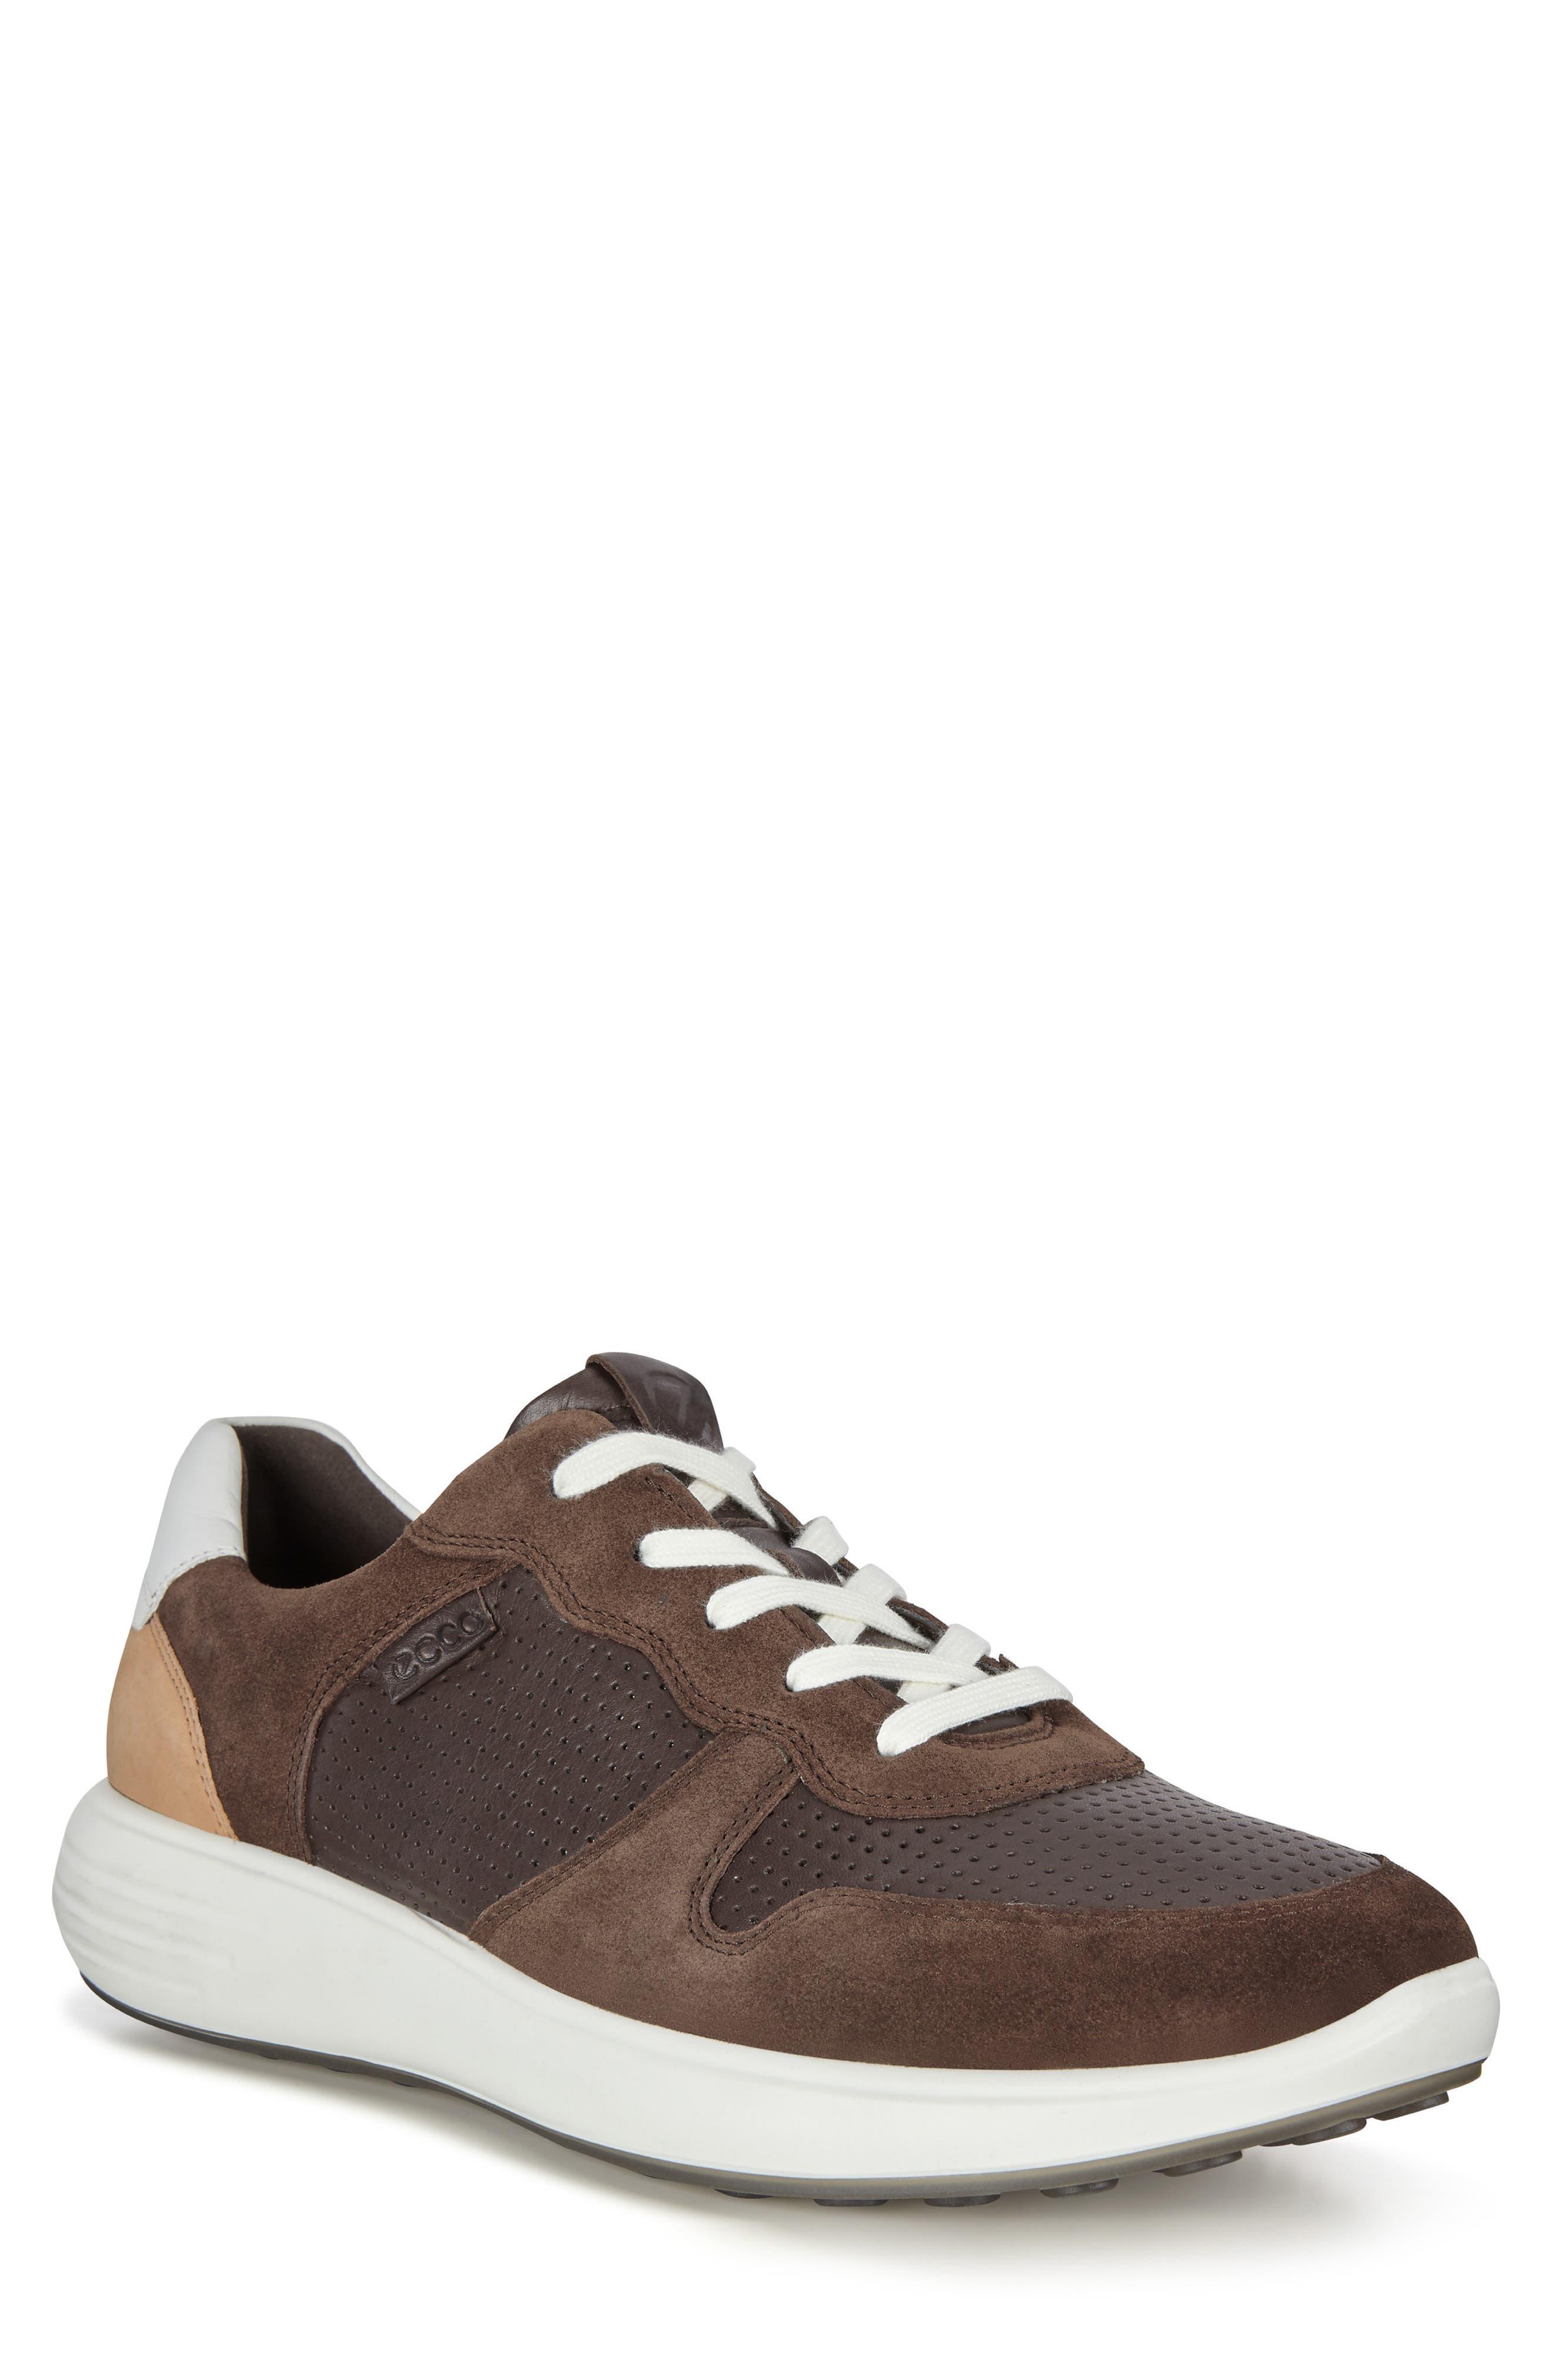 ECCO | Soft 7 Retro Runner Sneaker